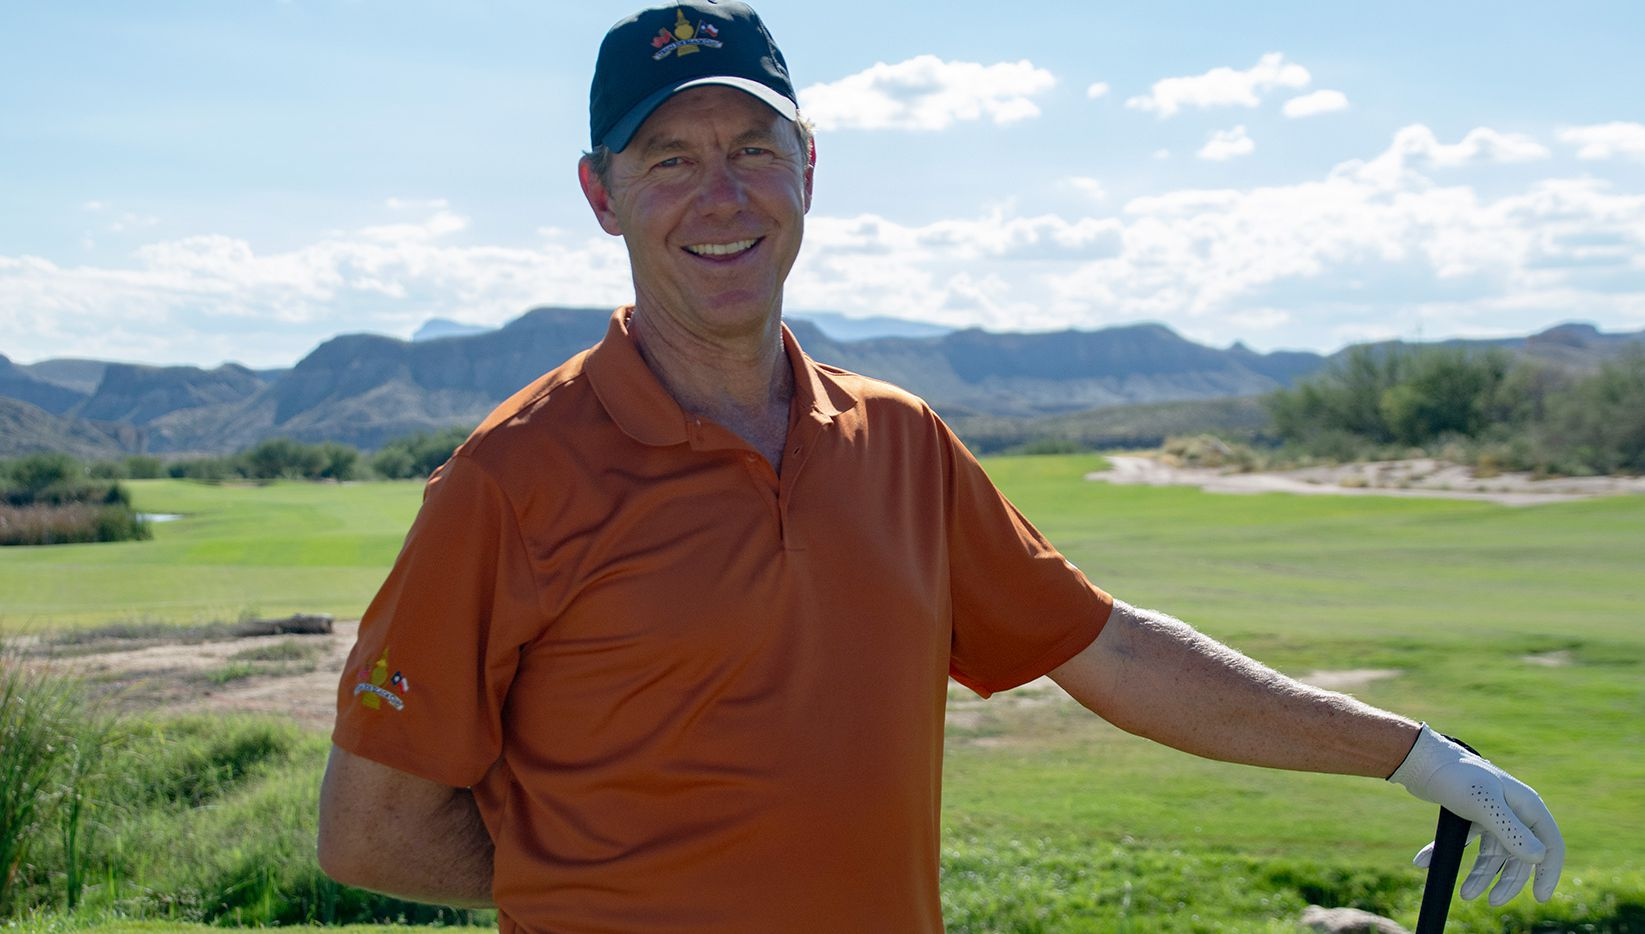 Cameron Doan, head golf professional at Preston Trail Golf Club in Dallas.